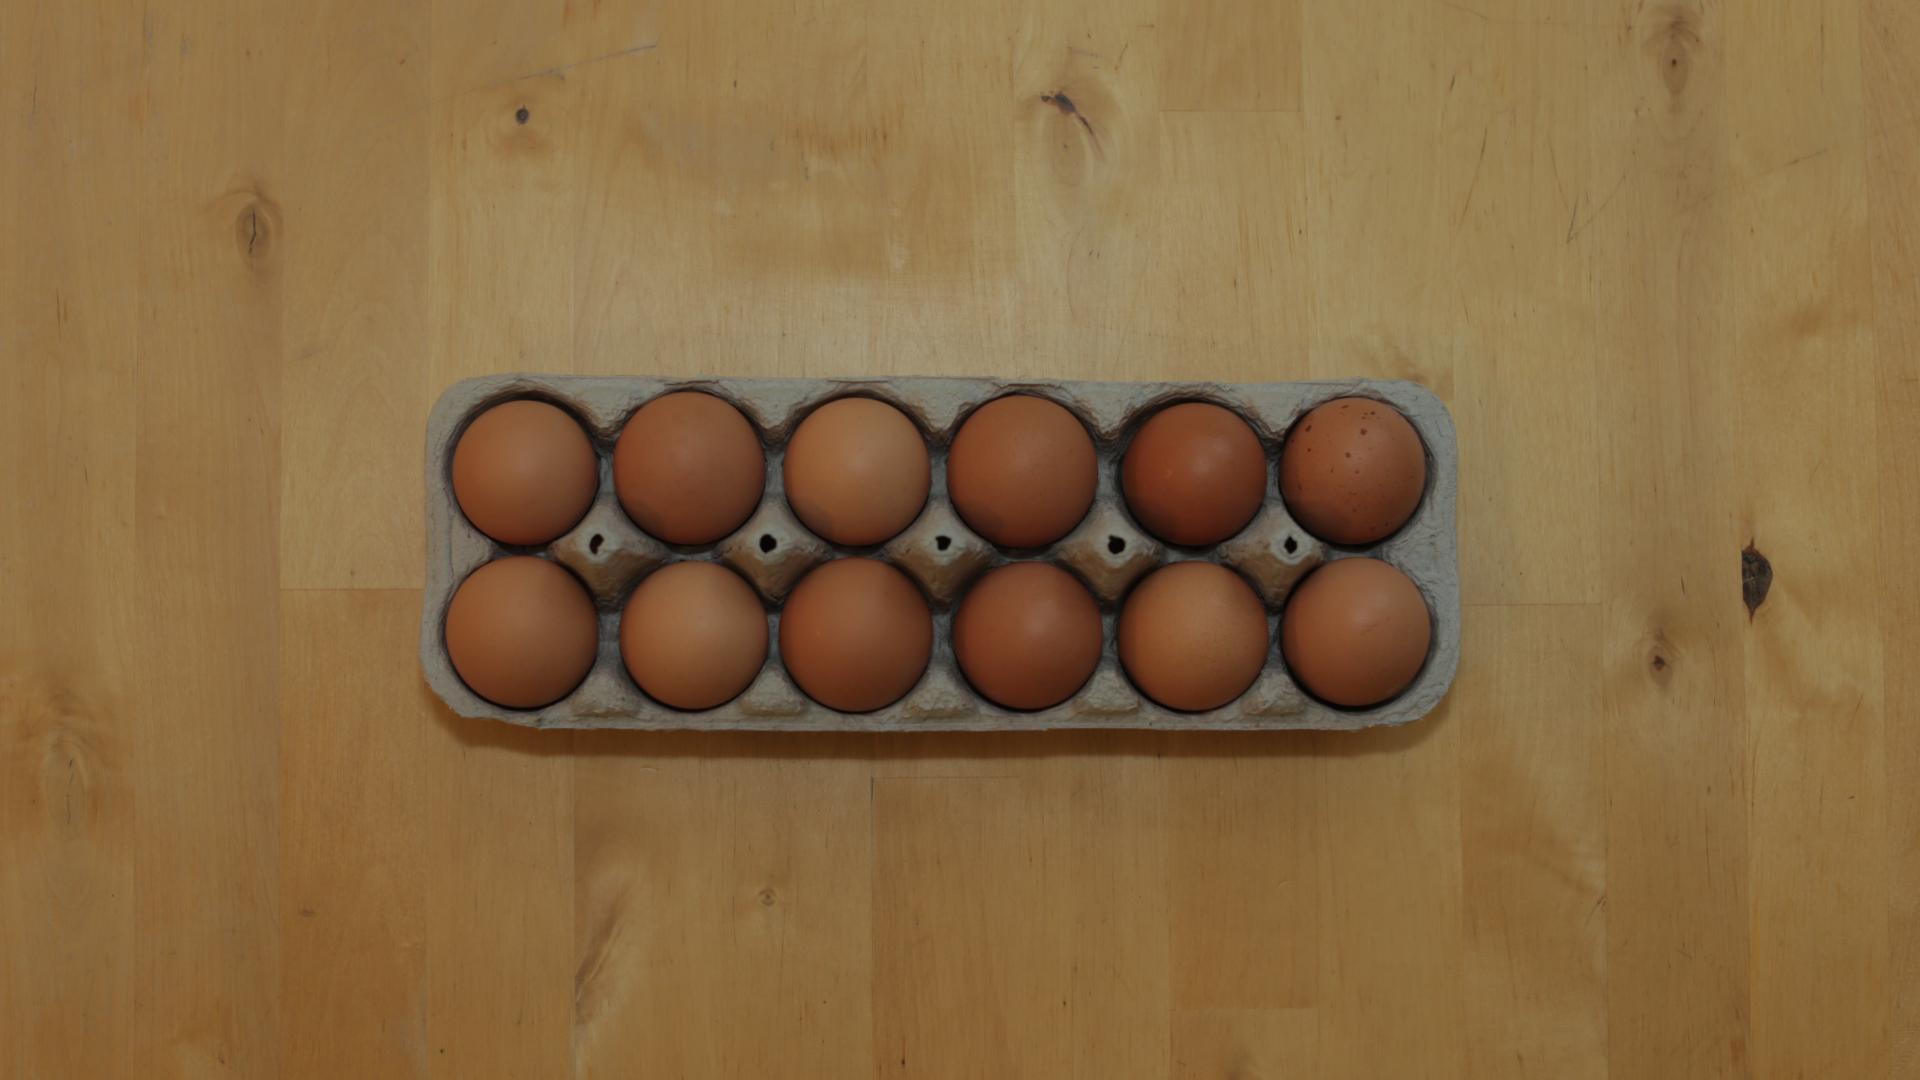 Nothing makes a balanced breakfast like a balanced egg carton.